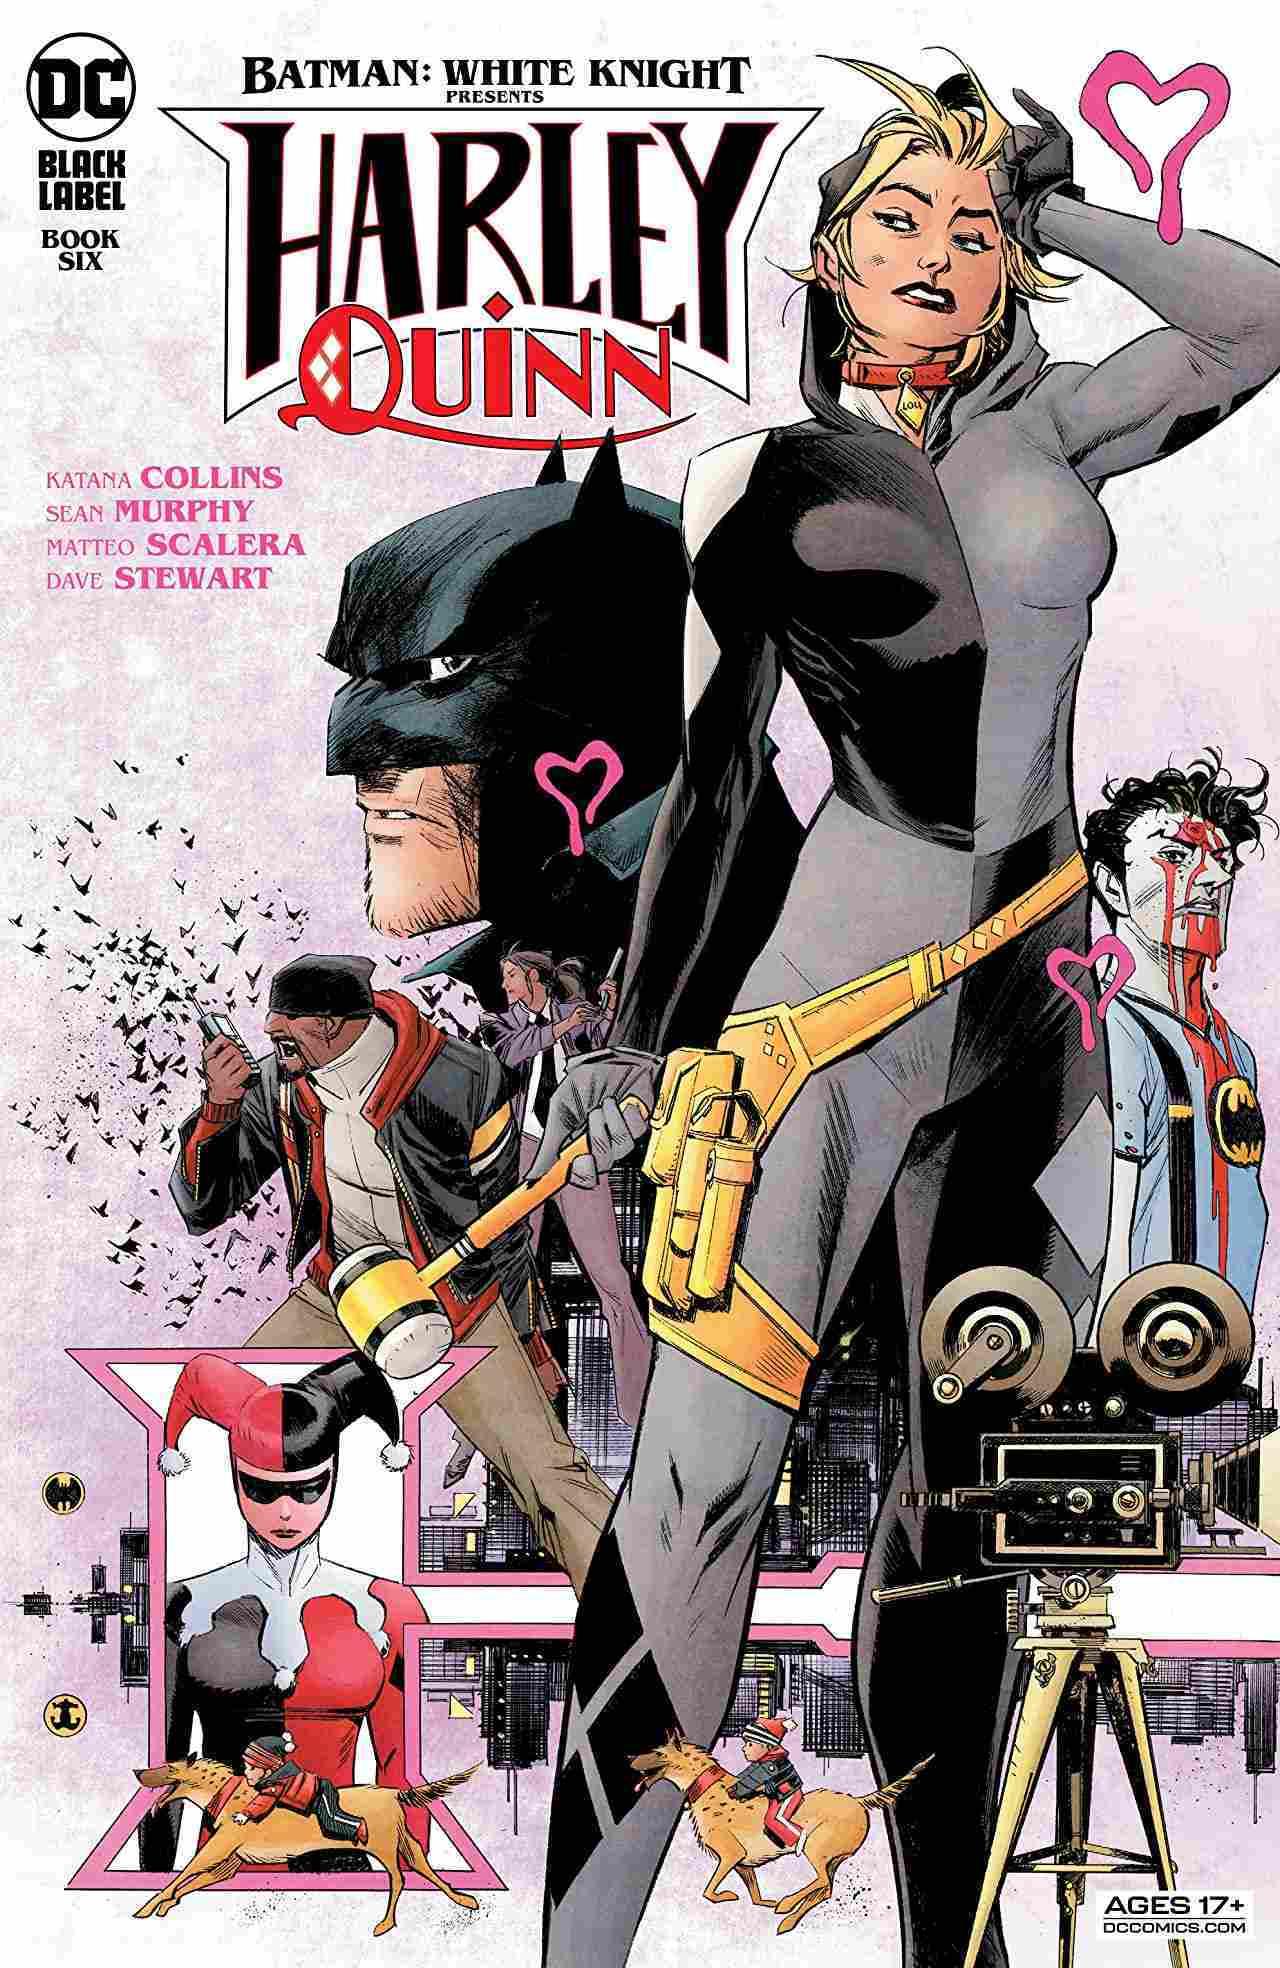 Batman White Knight Presents Harley Quinn #6